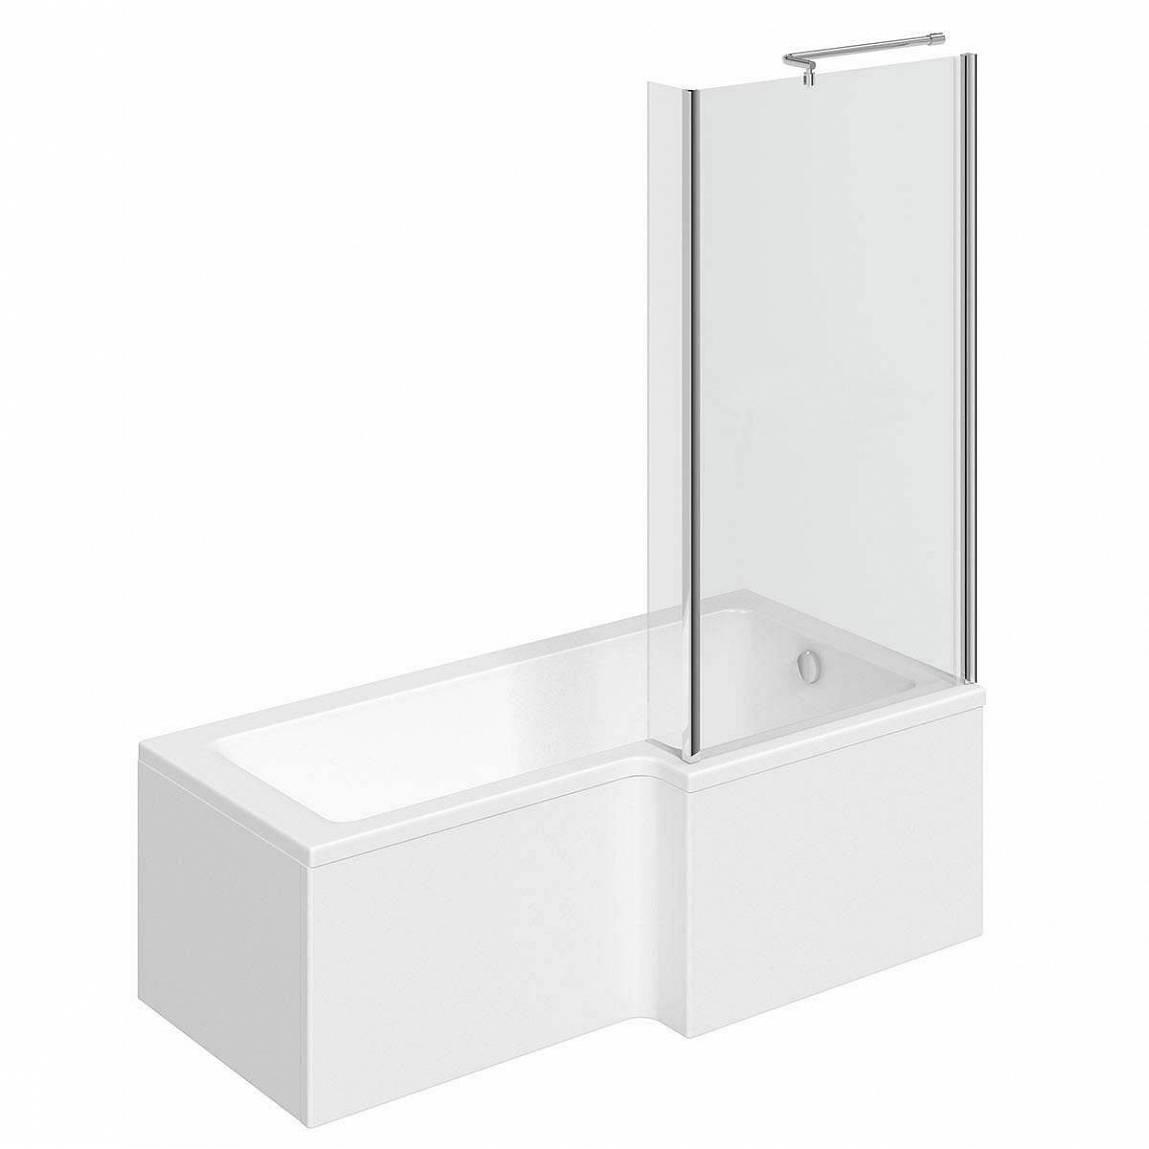 Image of Boston Shower Bath 1500 x 850 RH inc. Screen